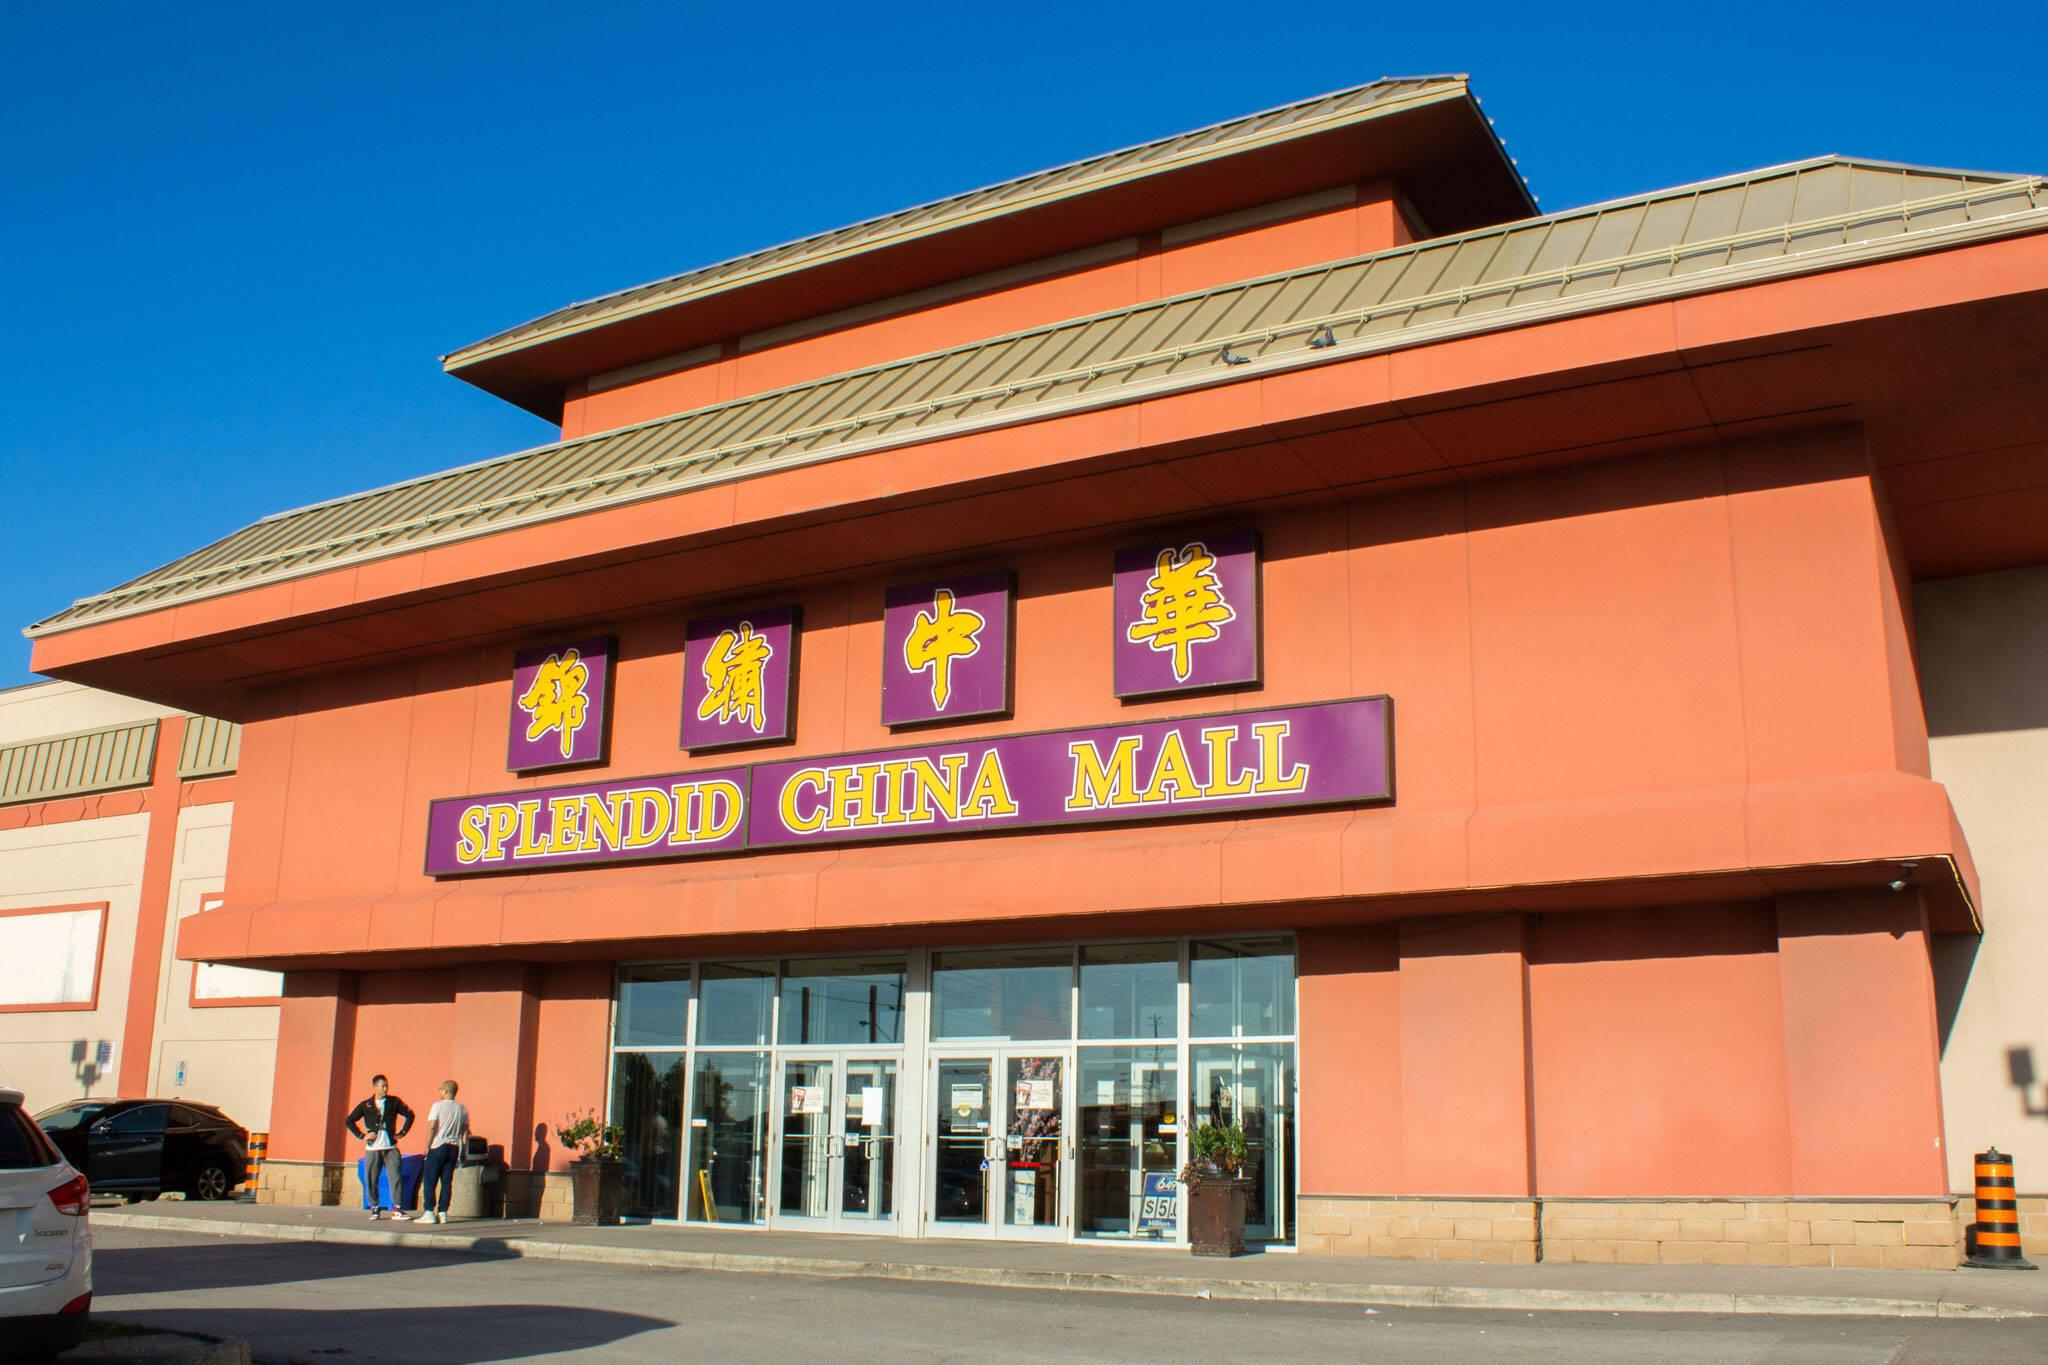 splendid china mall